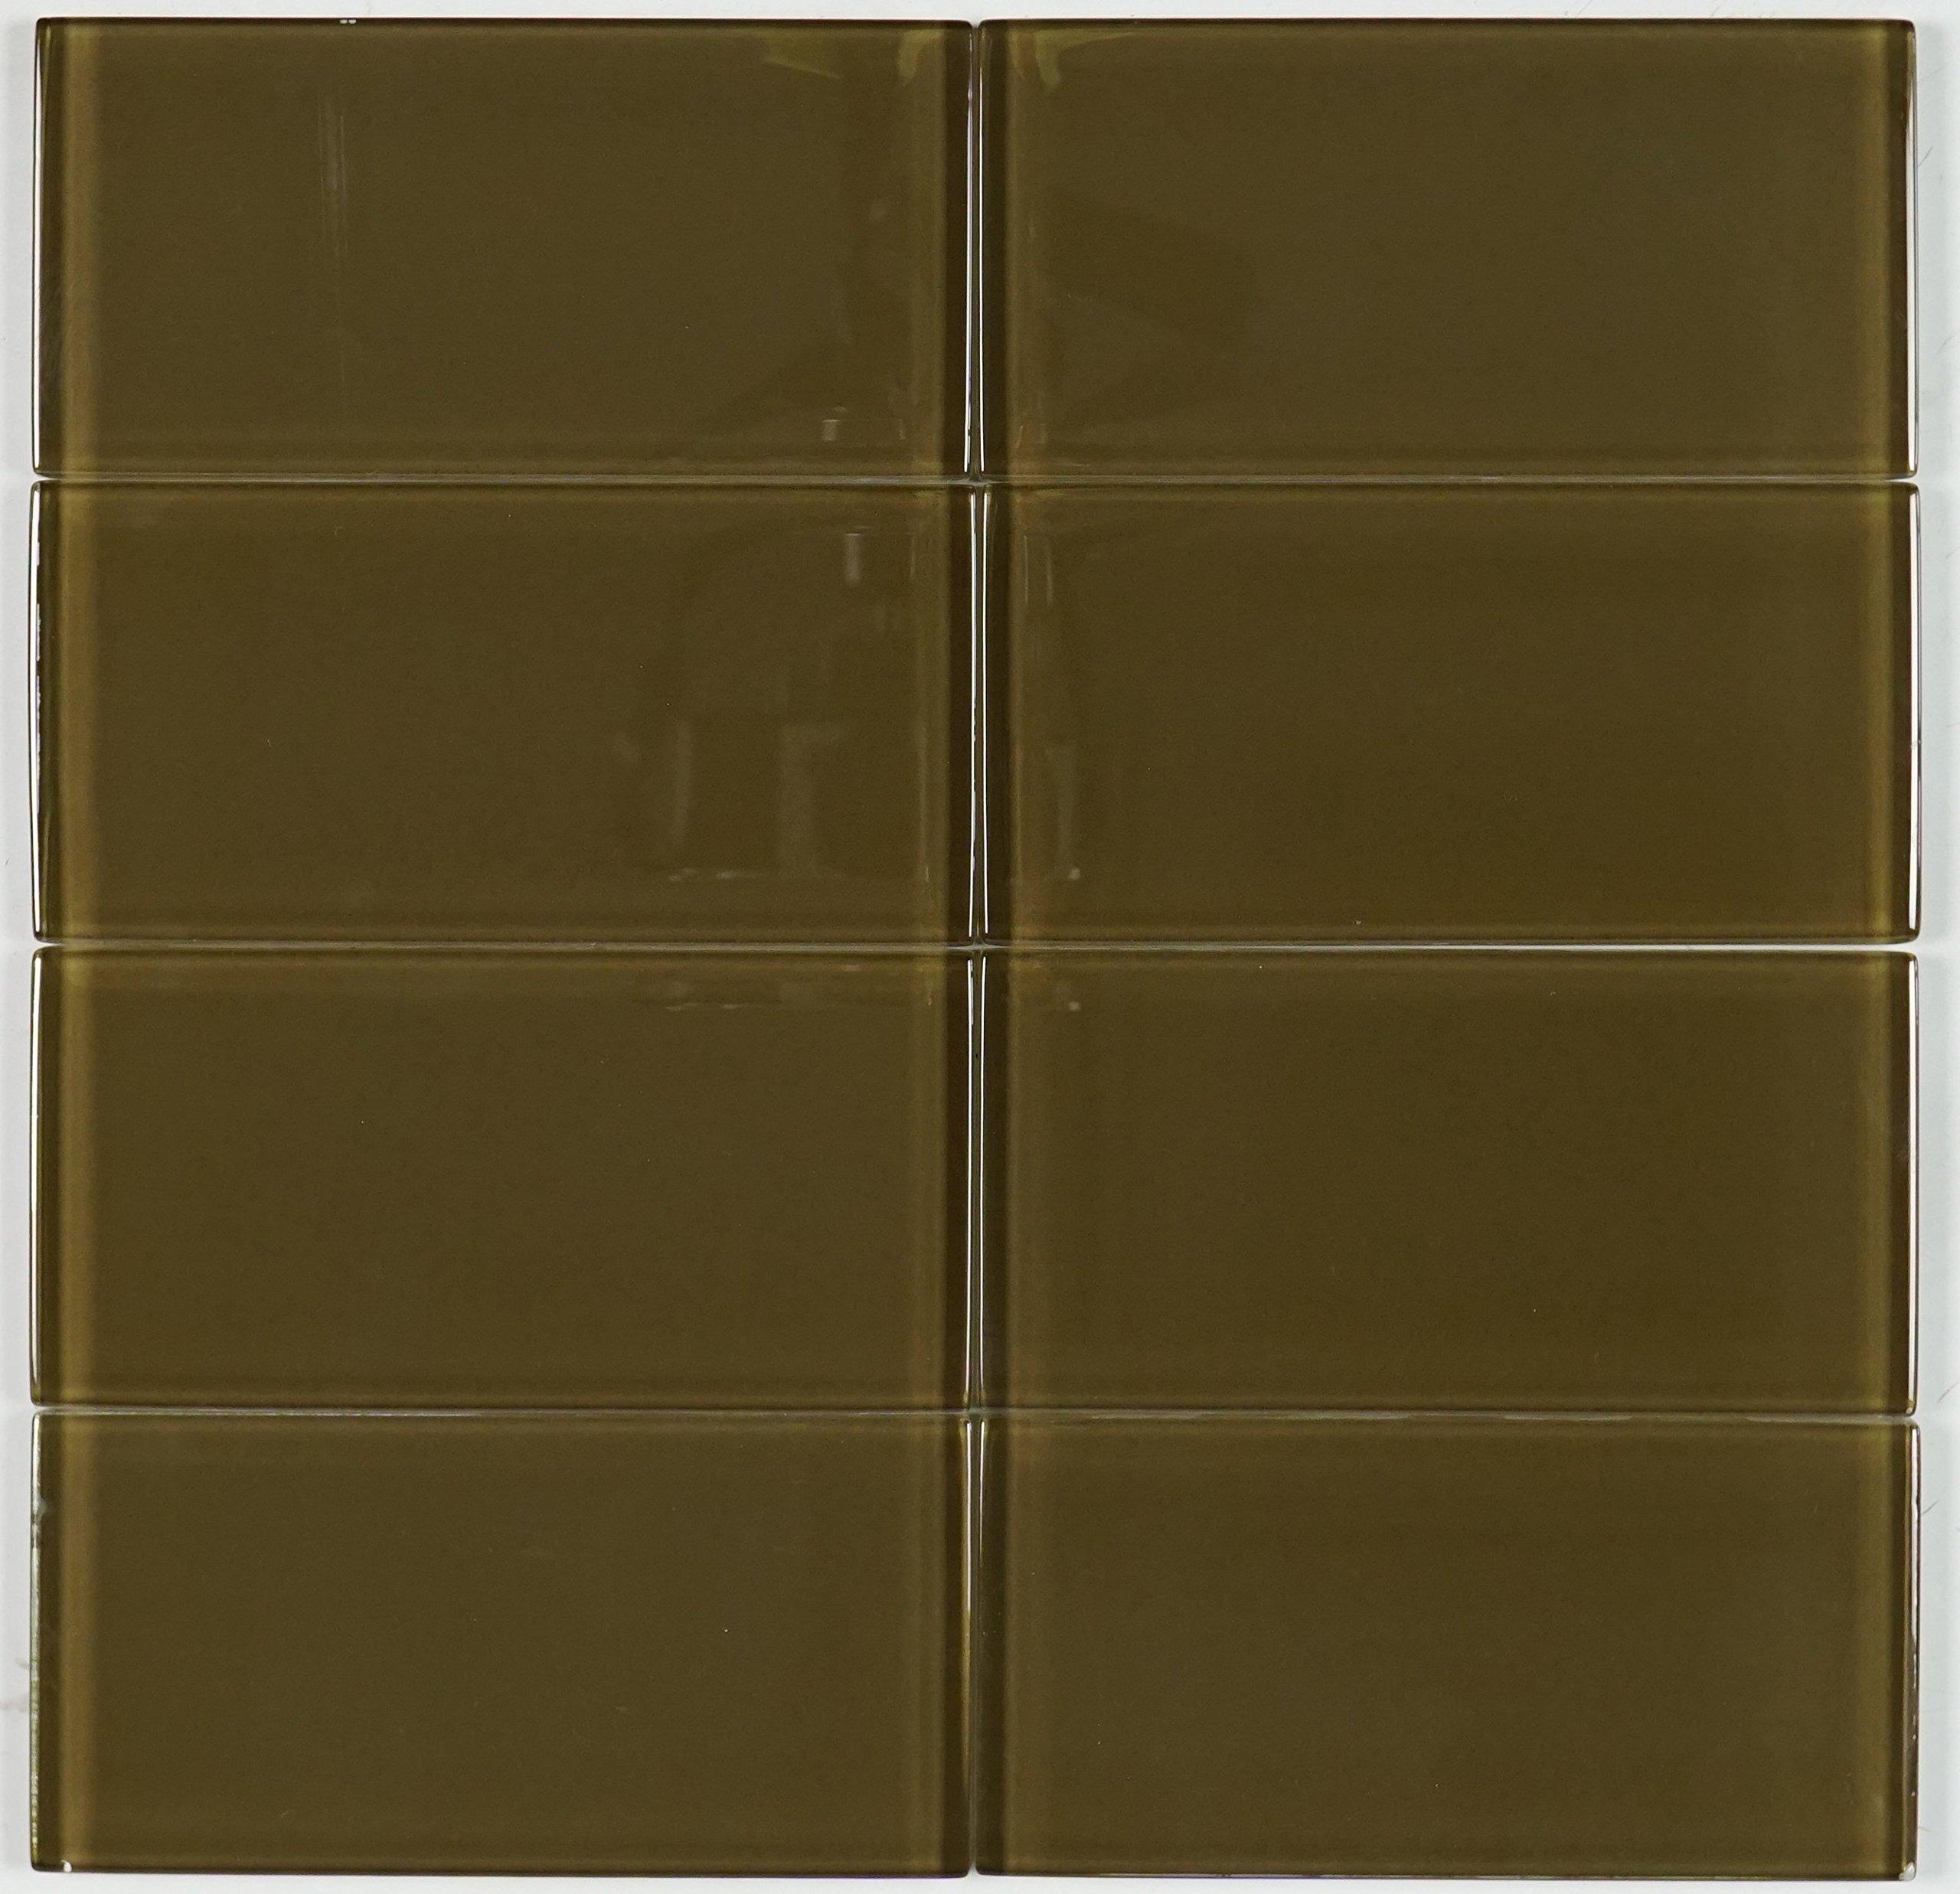 THG-06 Chocolate subway tile 3x6 - Kitchen and Bath Backsplash Wall Tile(8pcs)